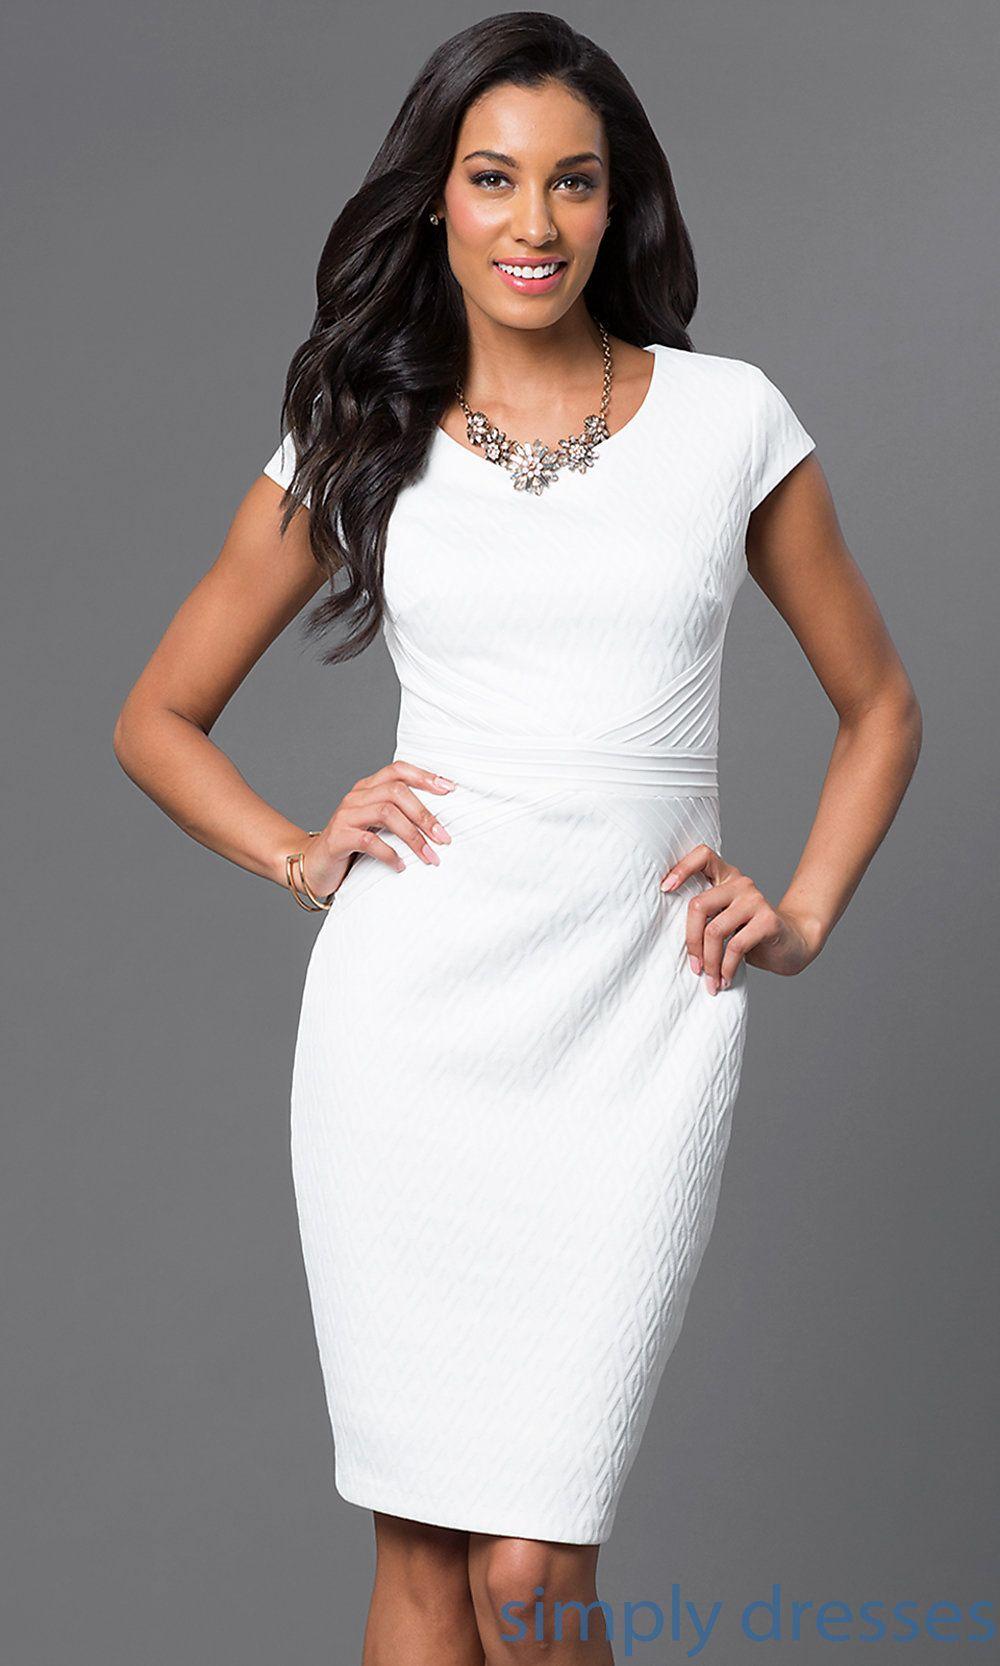 Dresses Formal Prom Dresses Evening Wear Sg Adaju1anp White Short Party Dress Dresses White Dress Party [ 1666 x 1000 Pixel ]